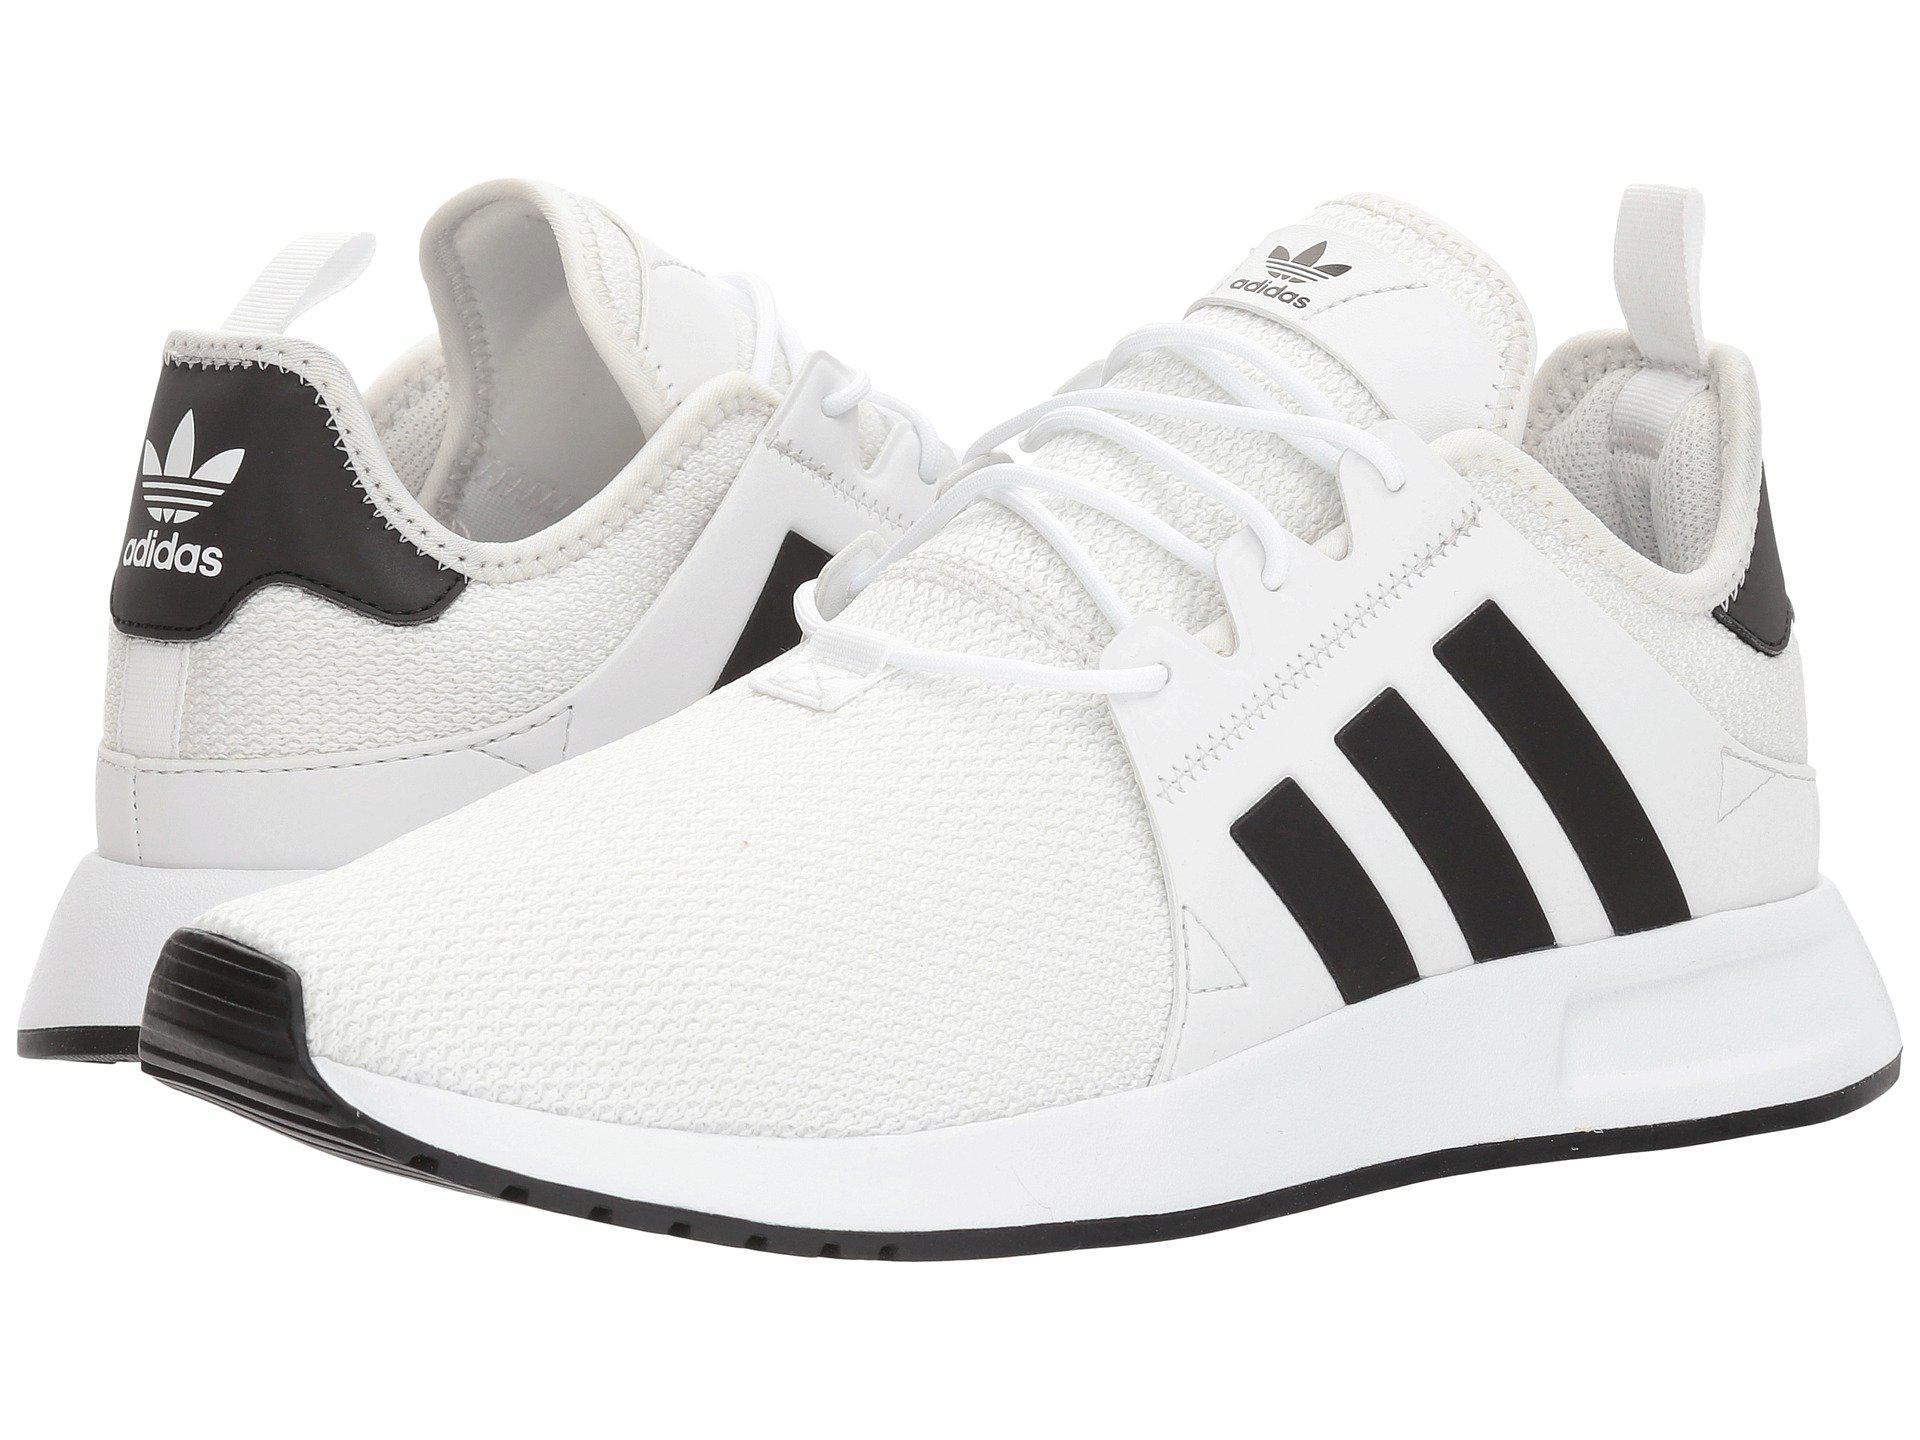 lyst adidas originali x a infrarossi (brown / calzature bianche / traccia